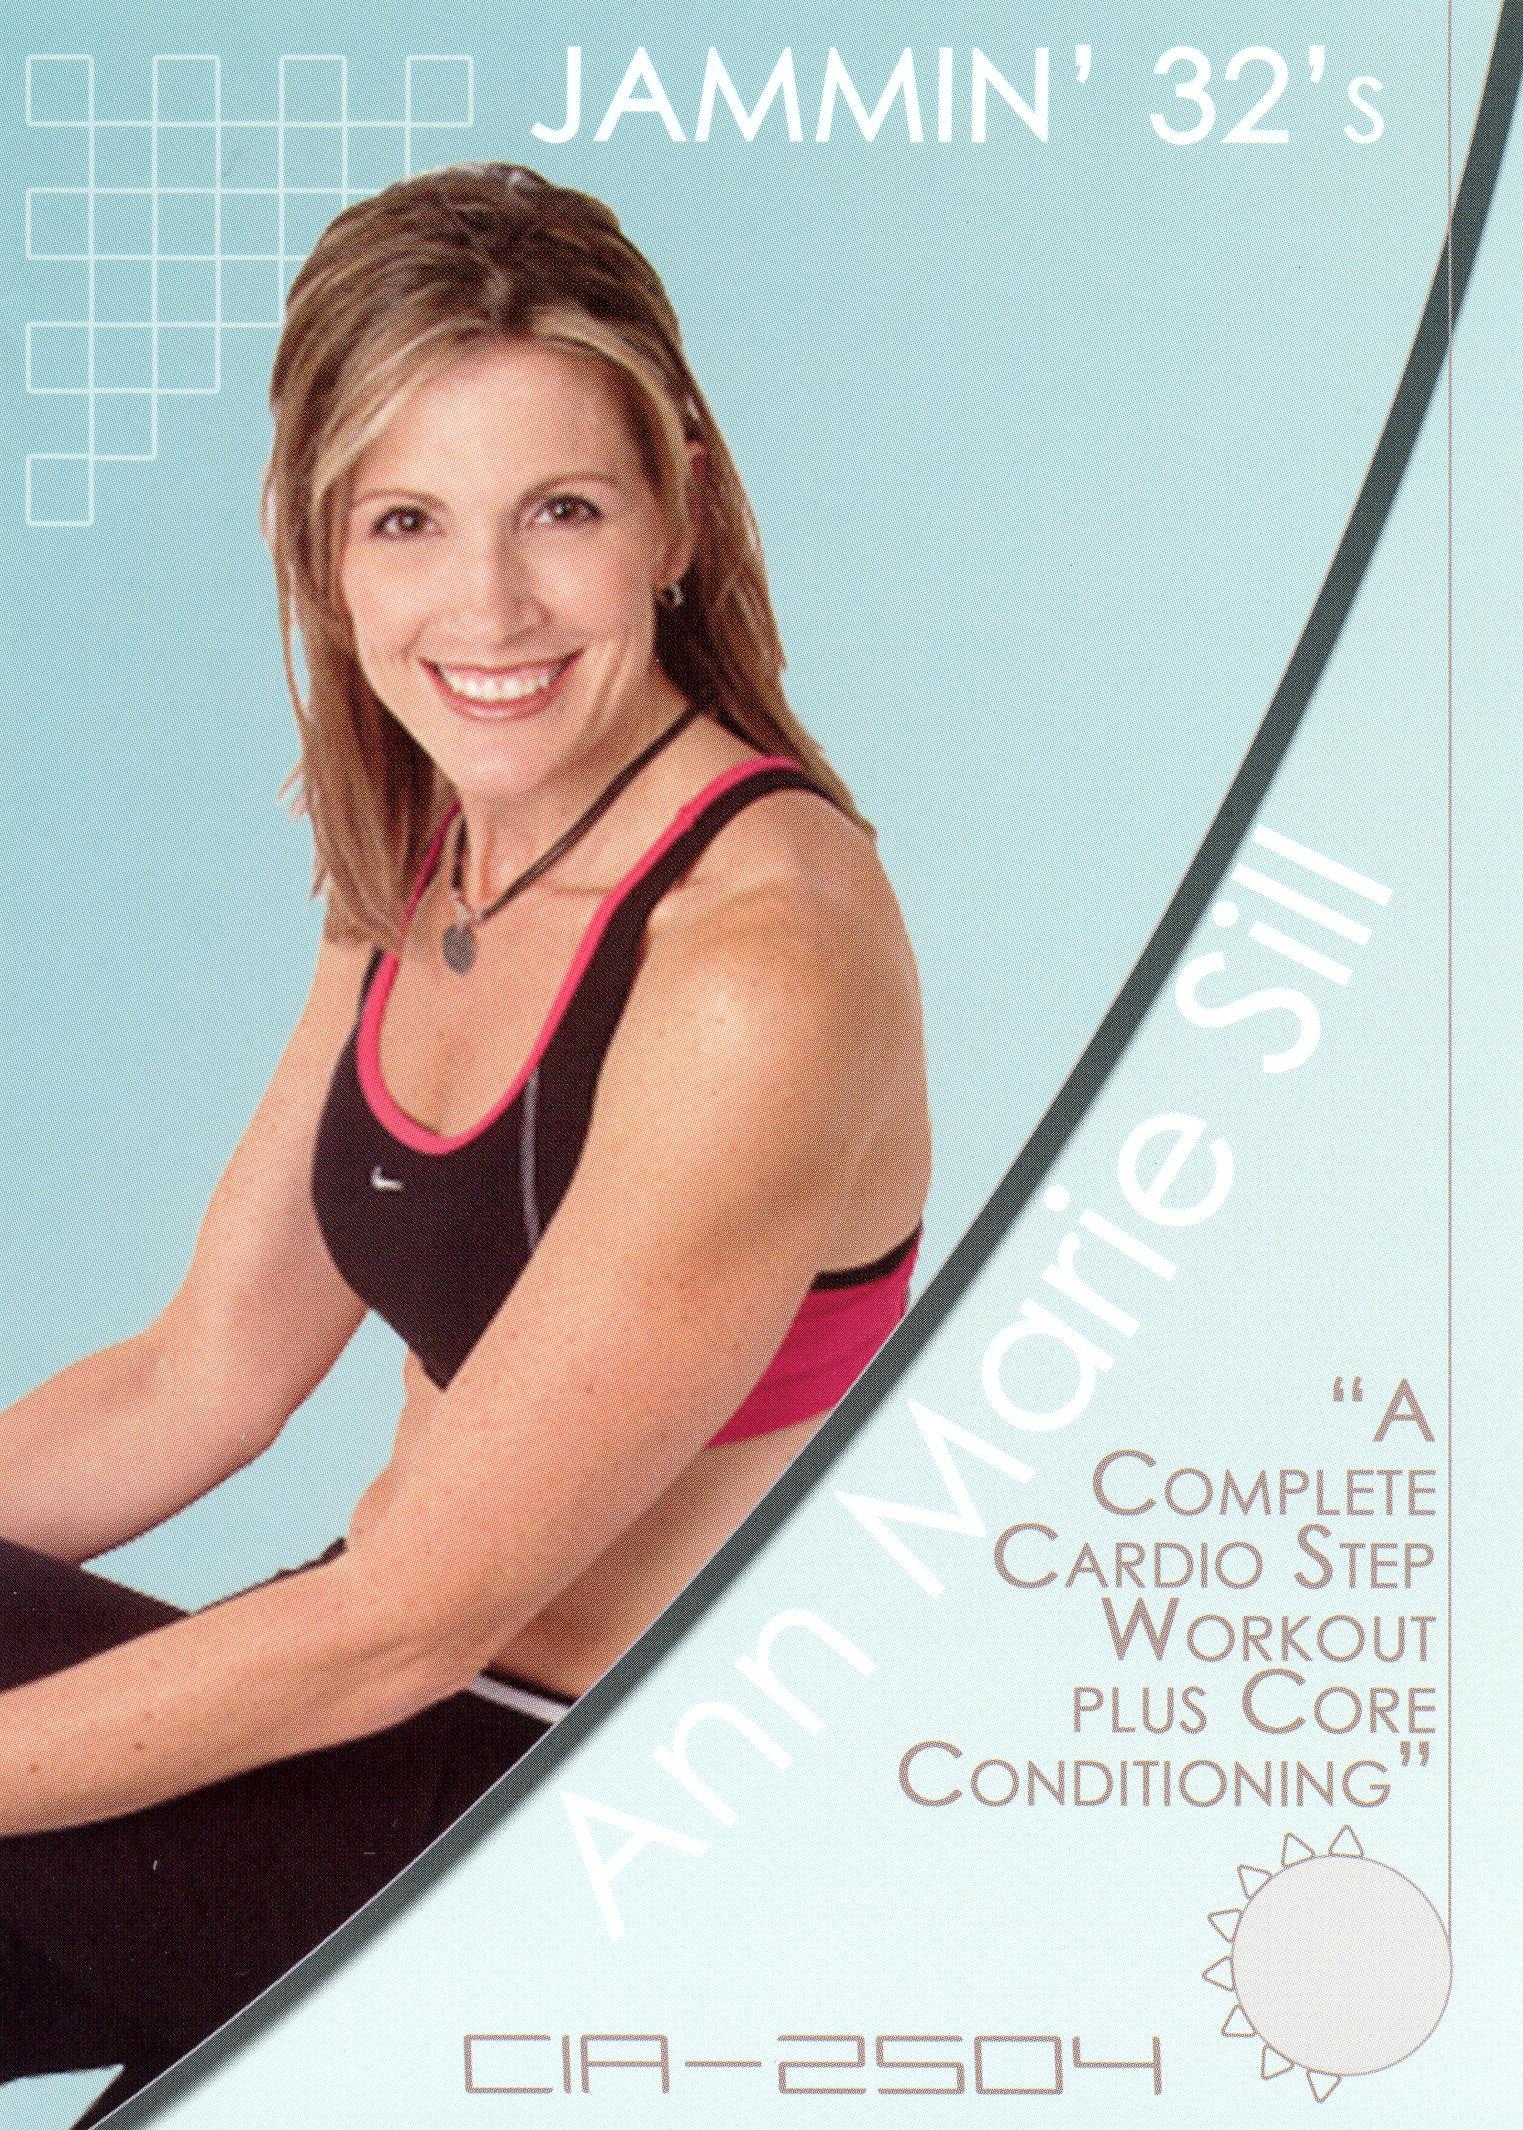 Ann Marie Sill: Jammin 32's - Complete Cardio Step